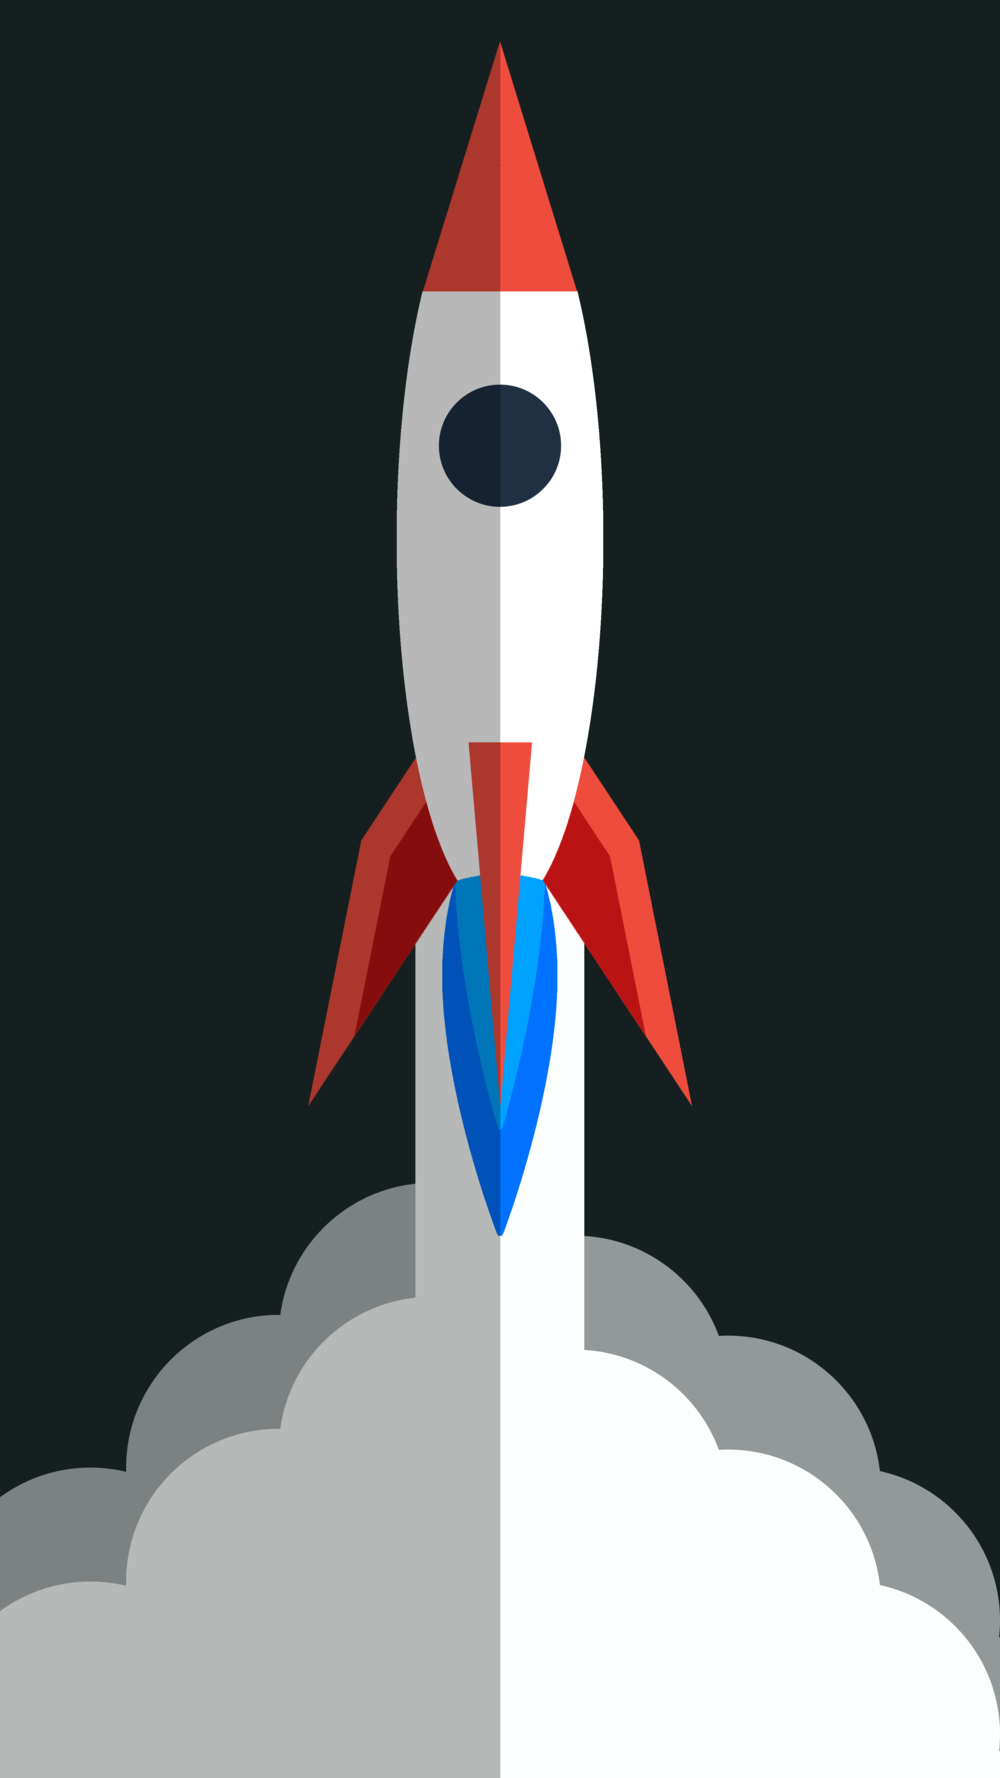 rocket-1954808.png